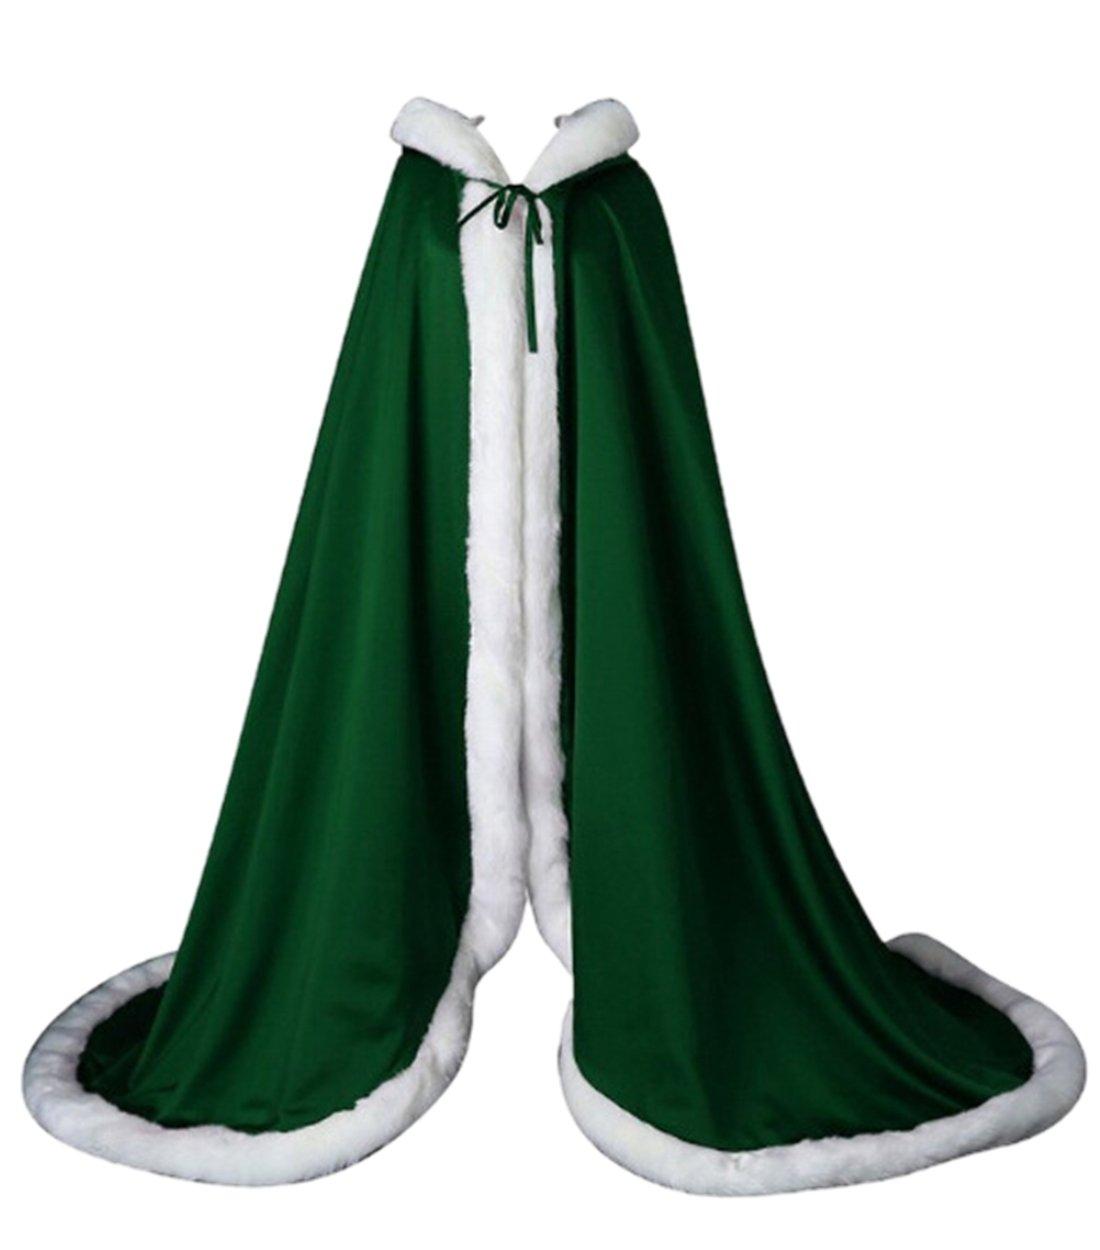 APXPF Women's Wedding Cape Bridal Cloak Long Faux Fur Cloak with Hood Outerwear Cloak Green